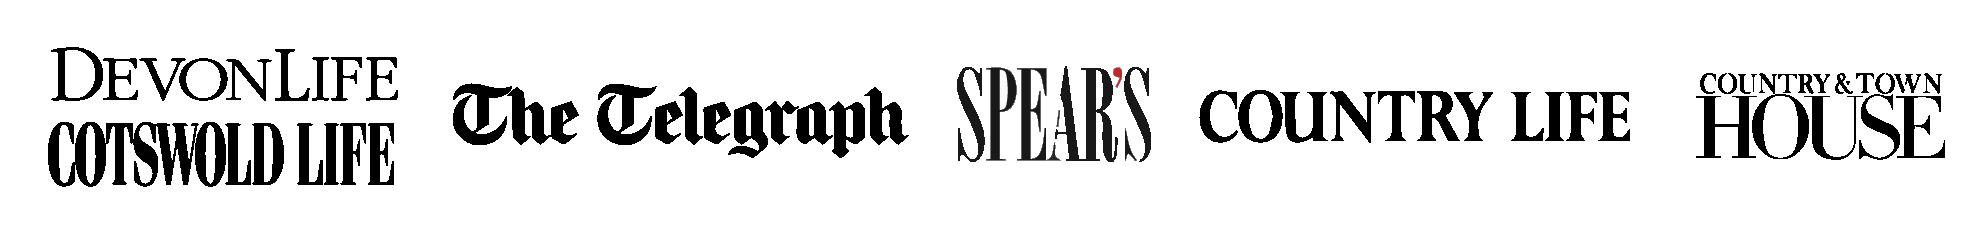 AsSeenIn3.png